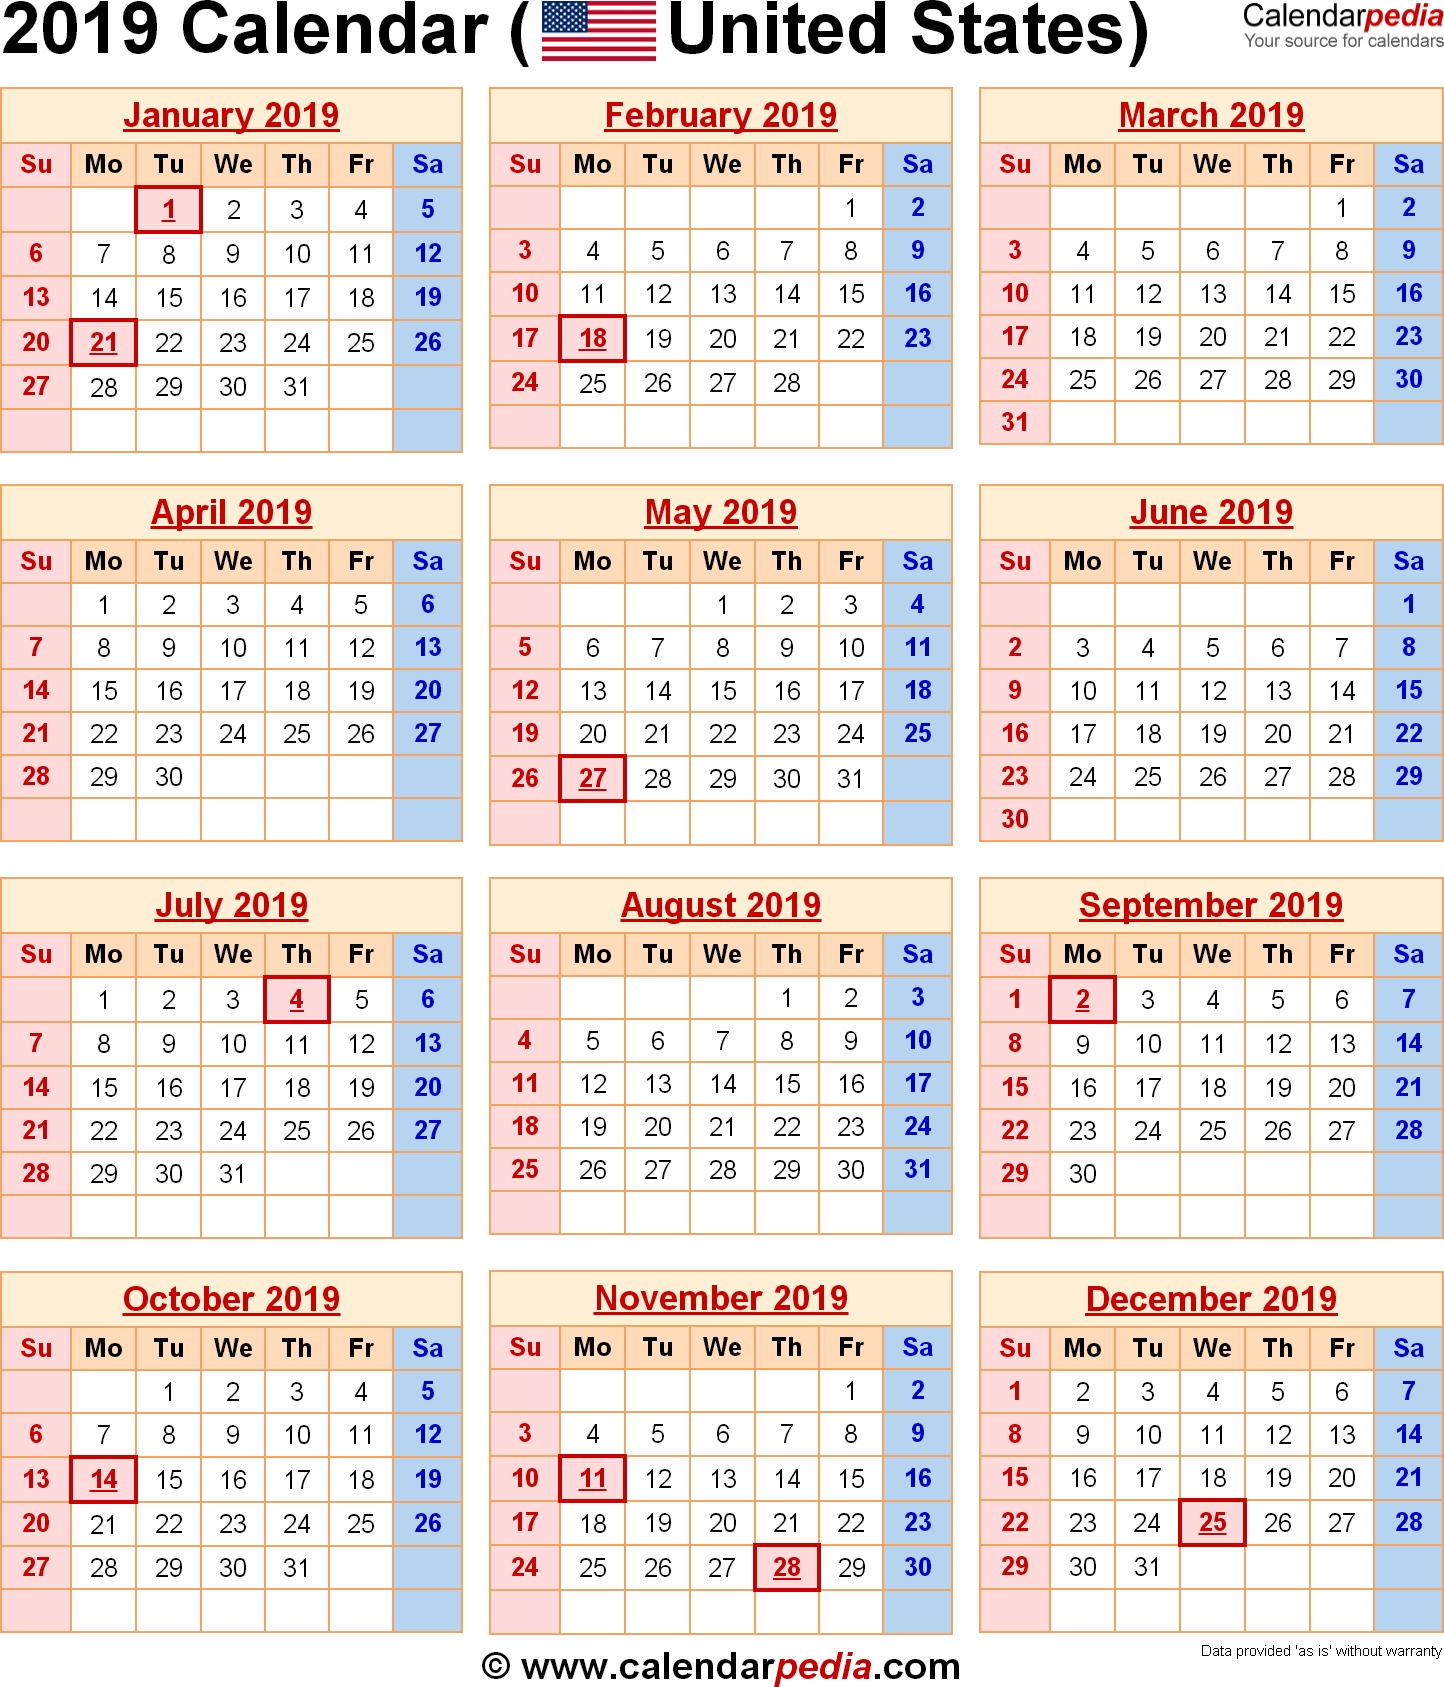 2019 Calendar United States | Us Federal Holidays | 2019 Calendar Us 445 Calendar 2019